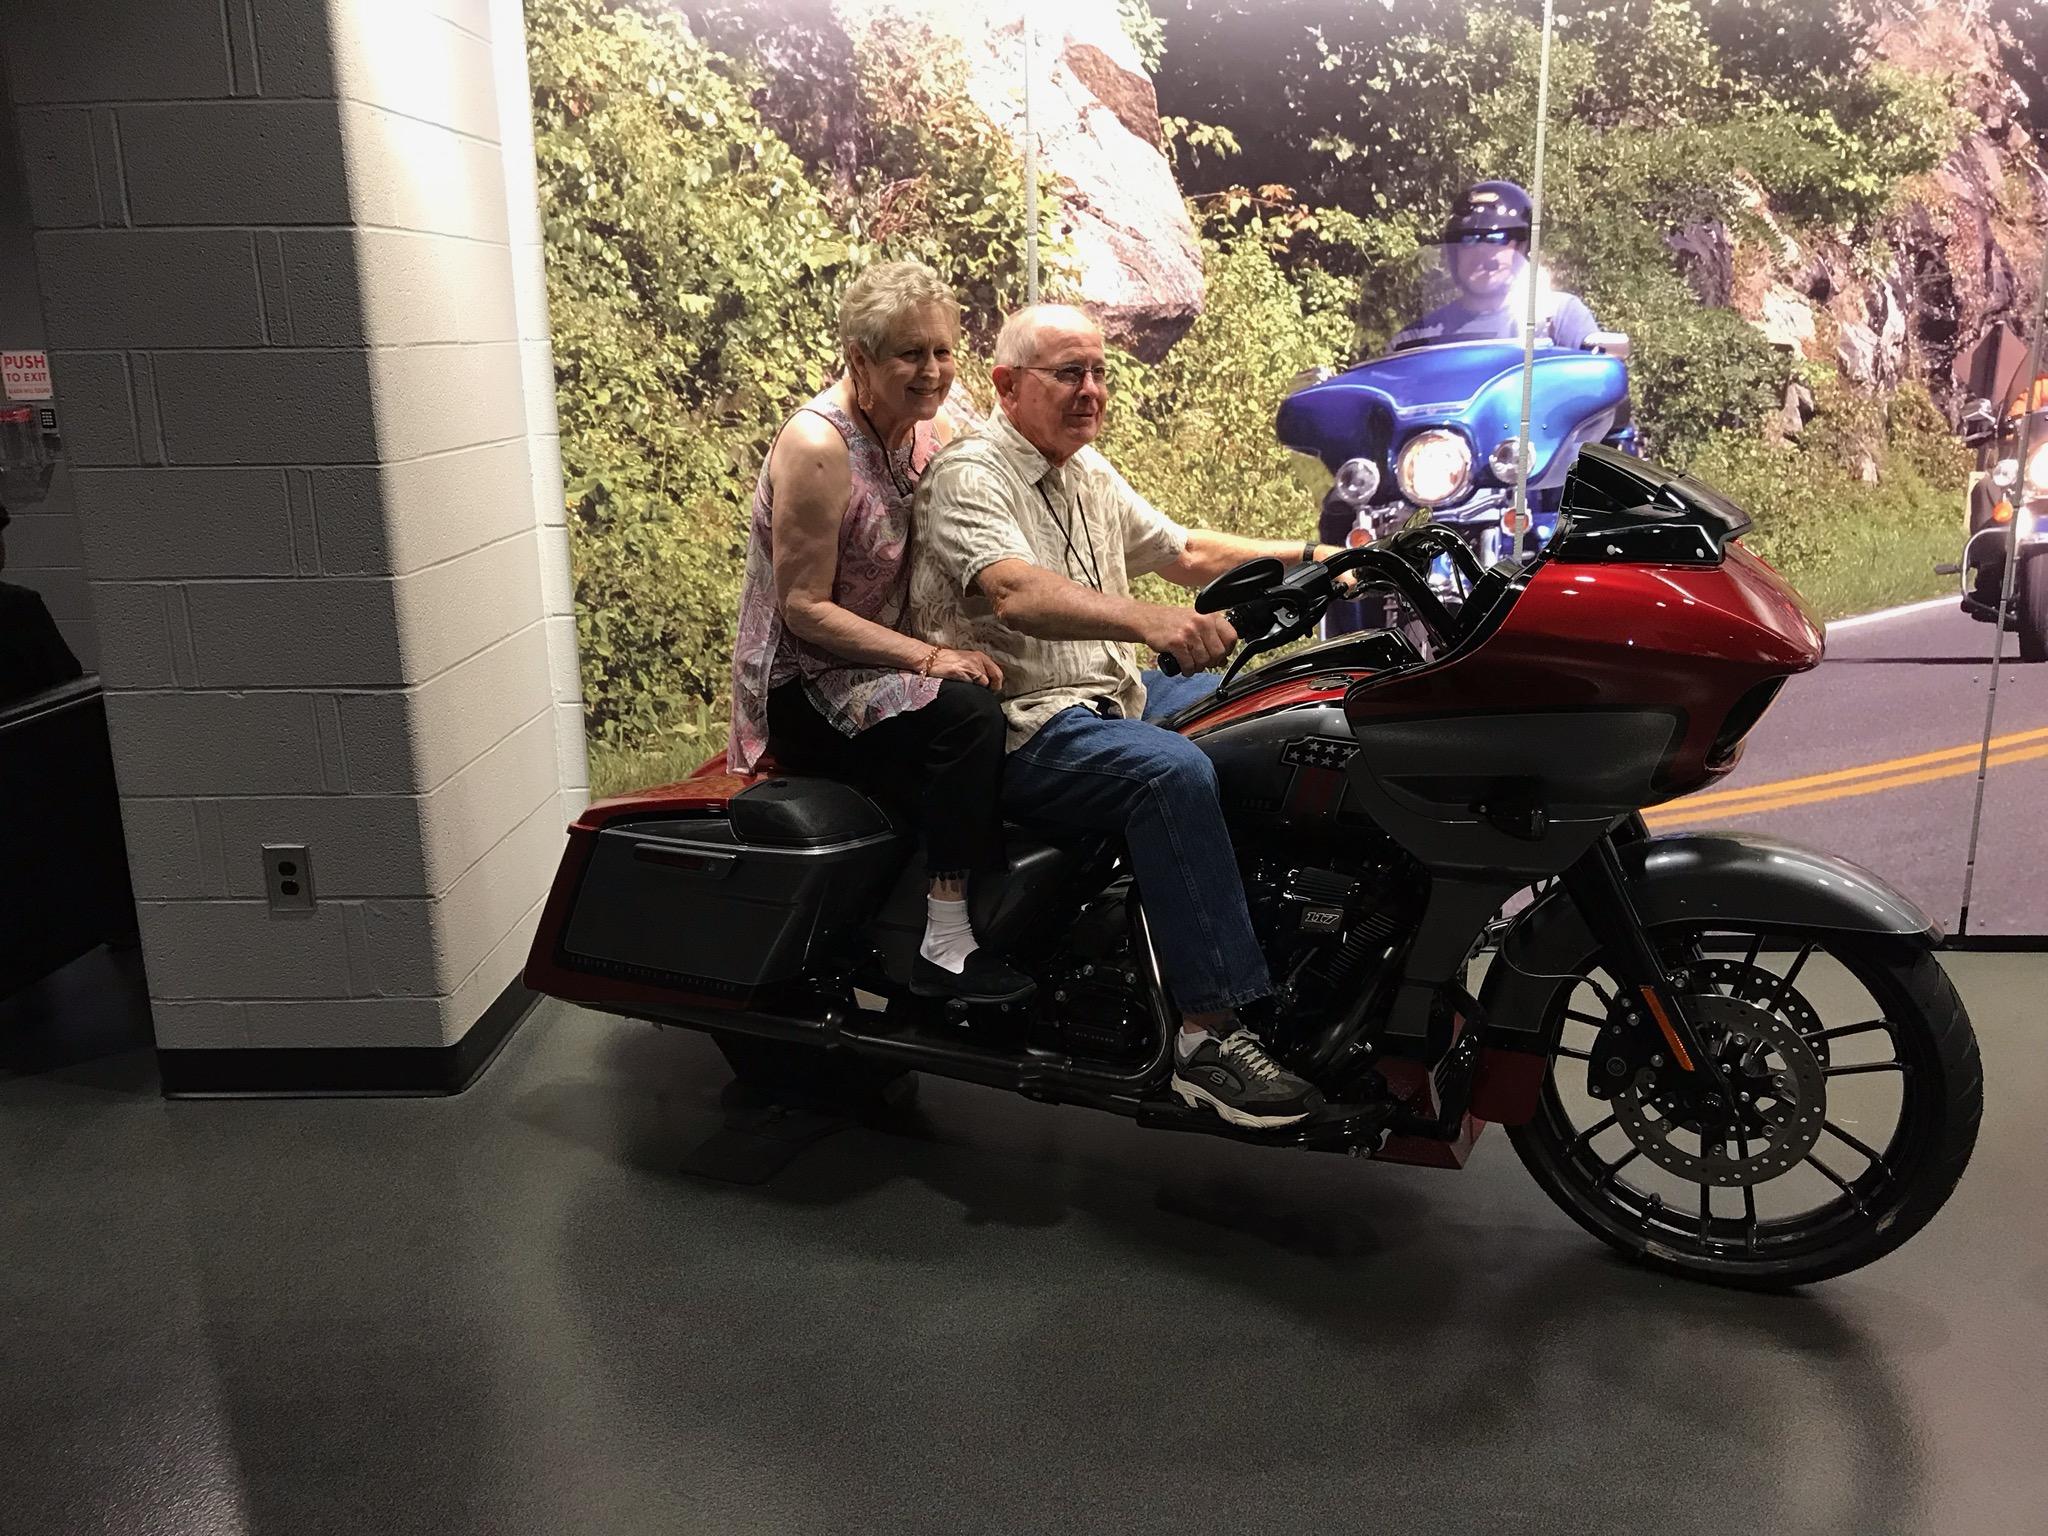 Russ and Corinne on Harley.jpg